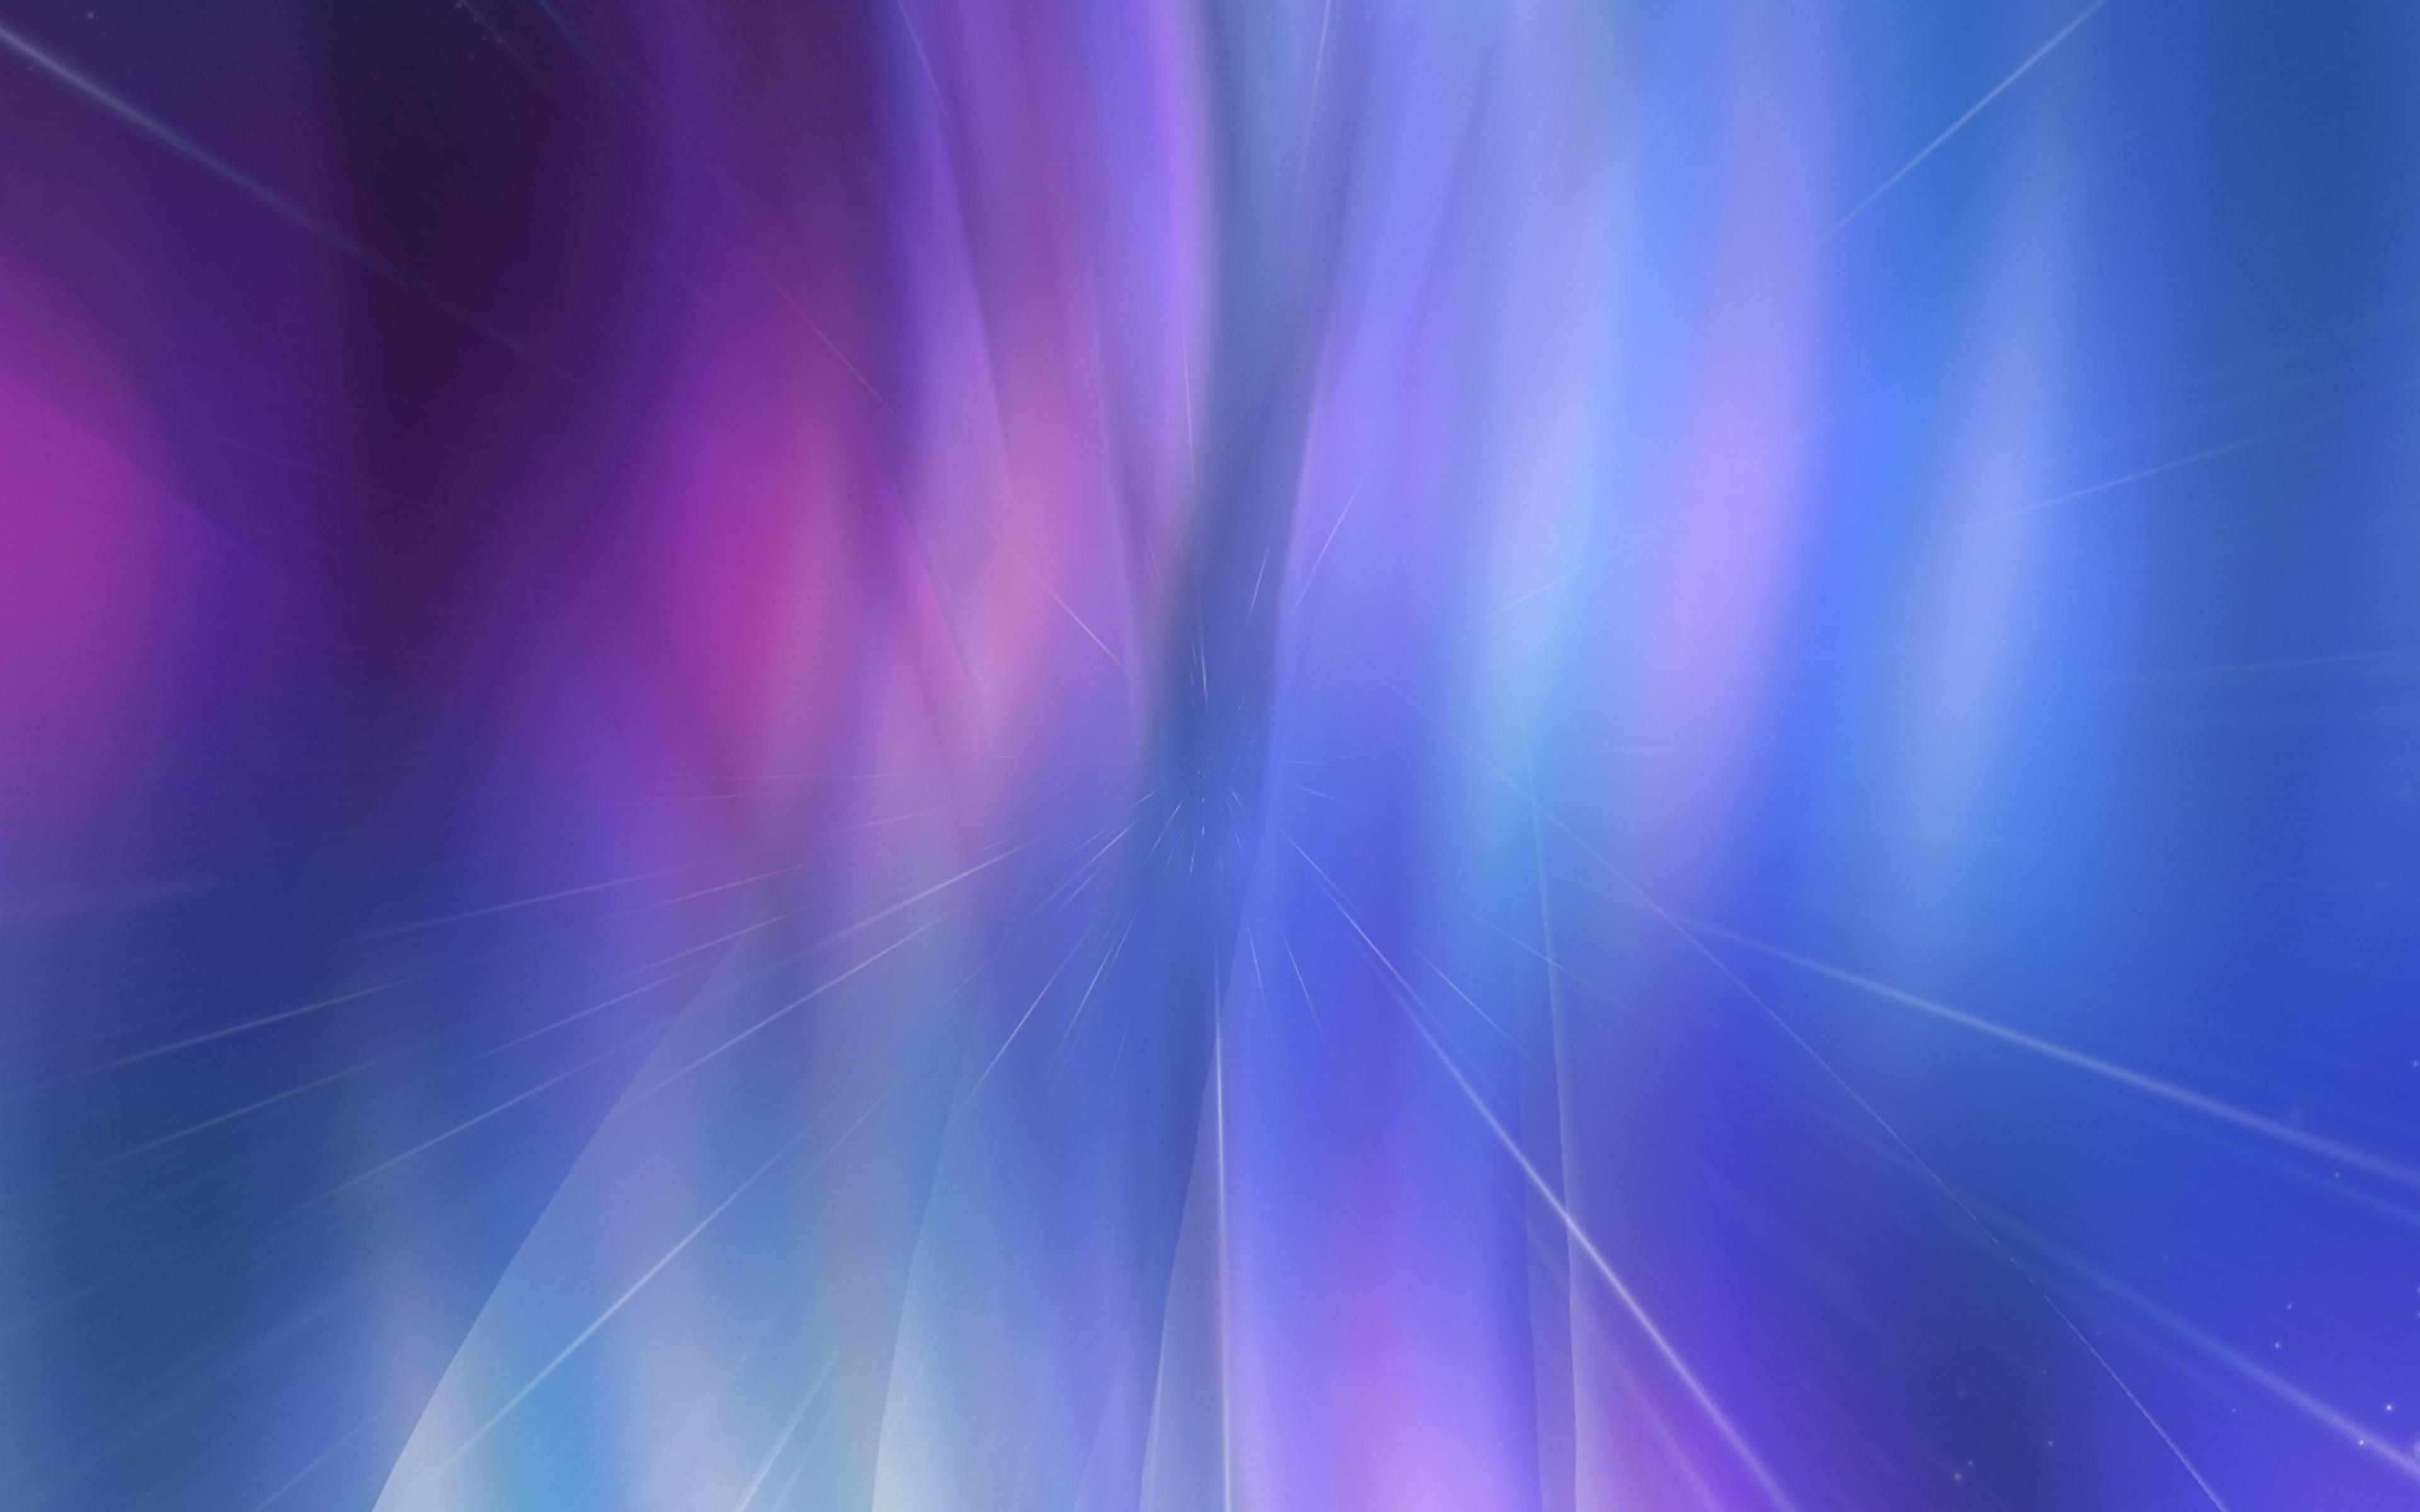 vp16-fantasy-purple-blue-abstract-pattern-wallpaper